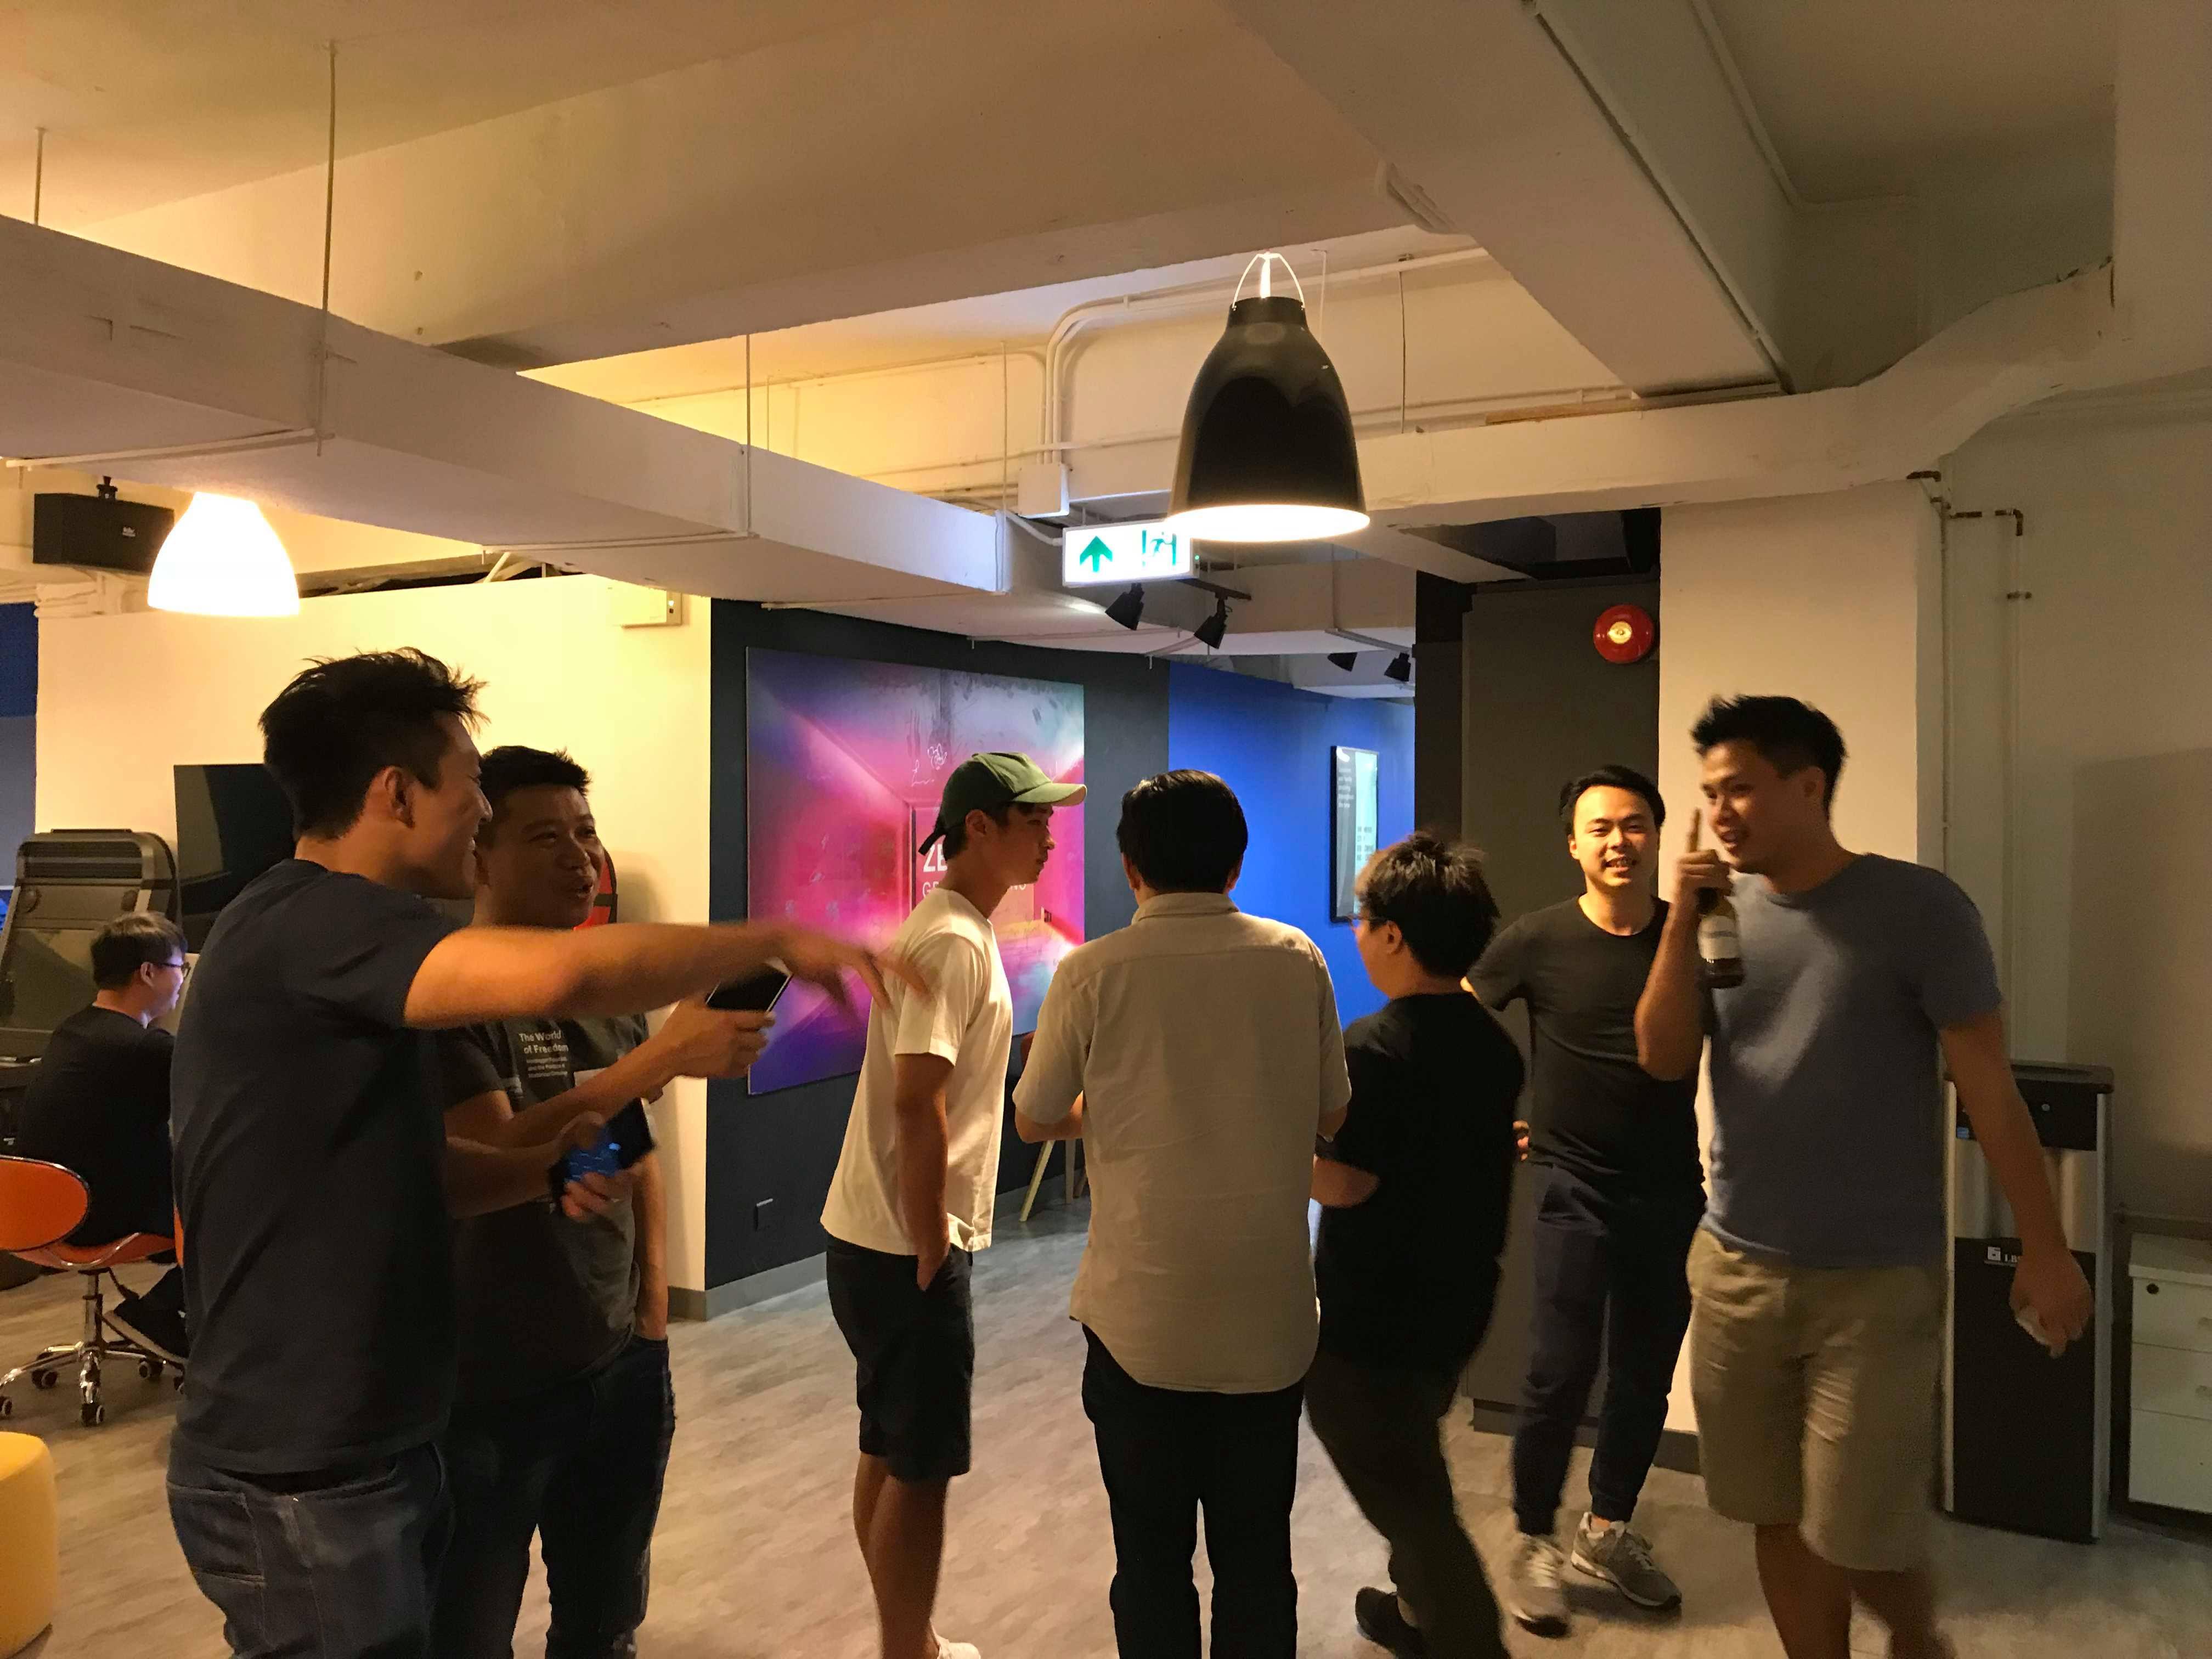 startup drinks, networking, zerozone